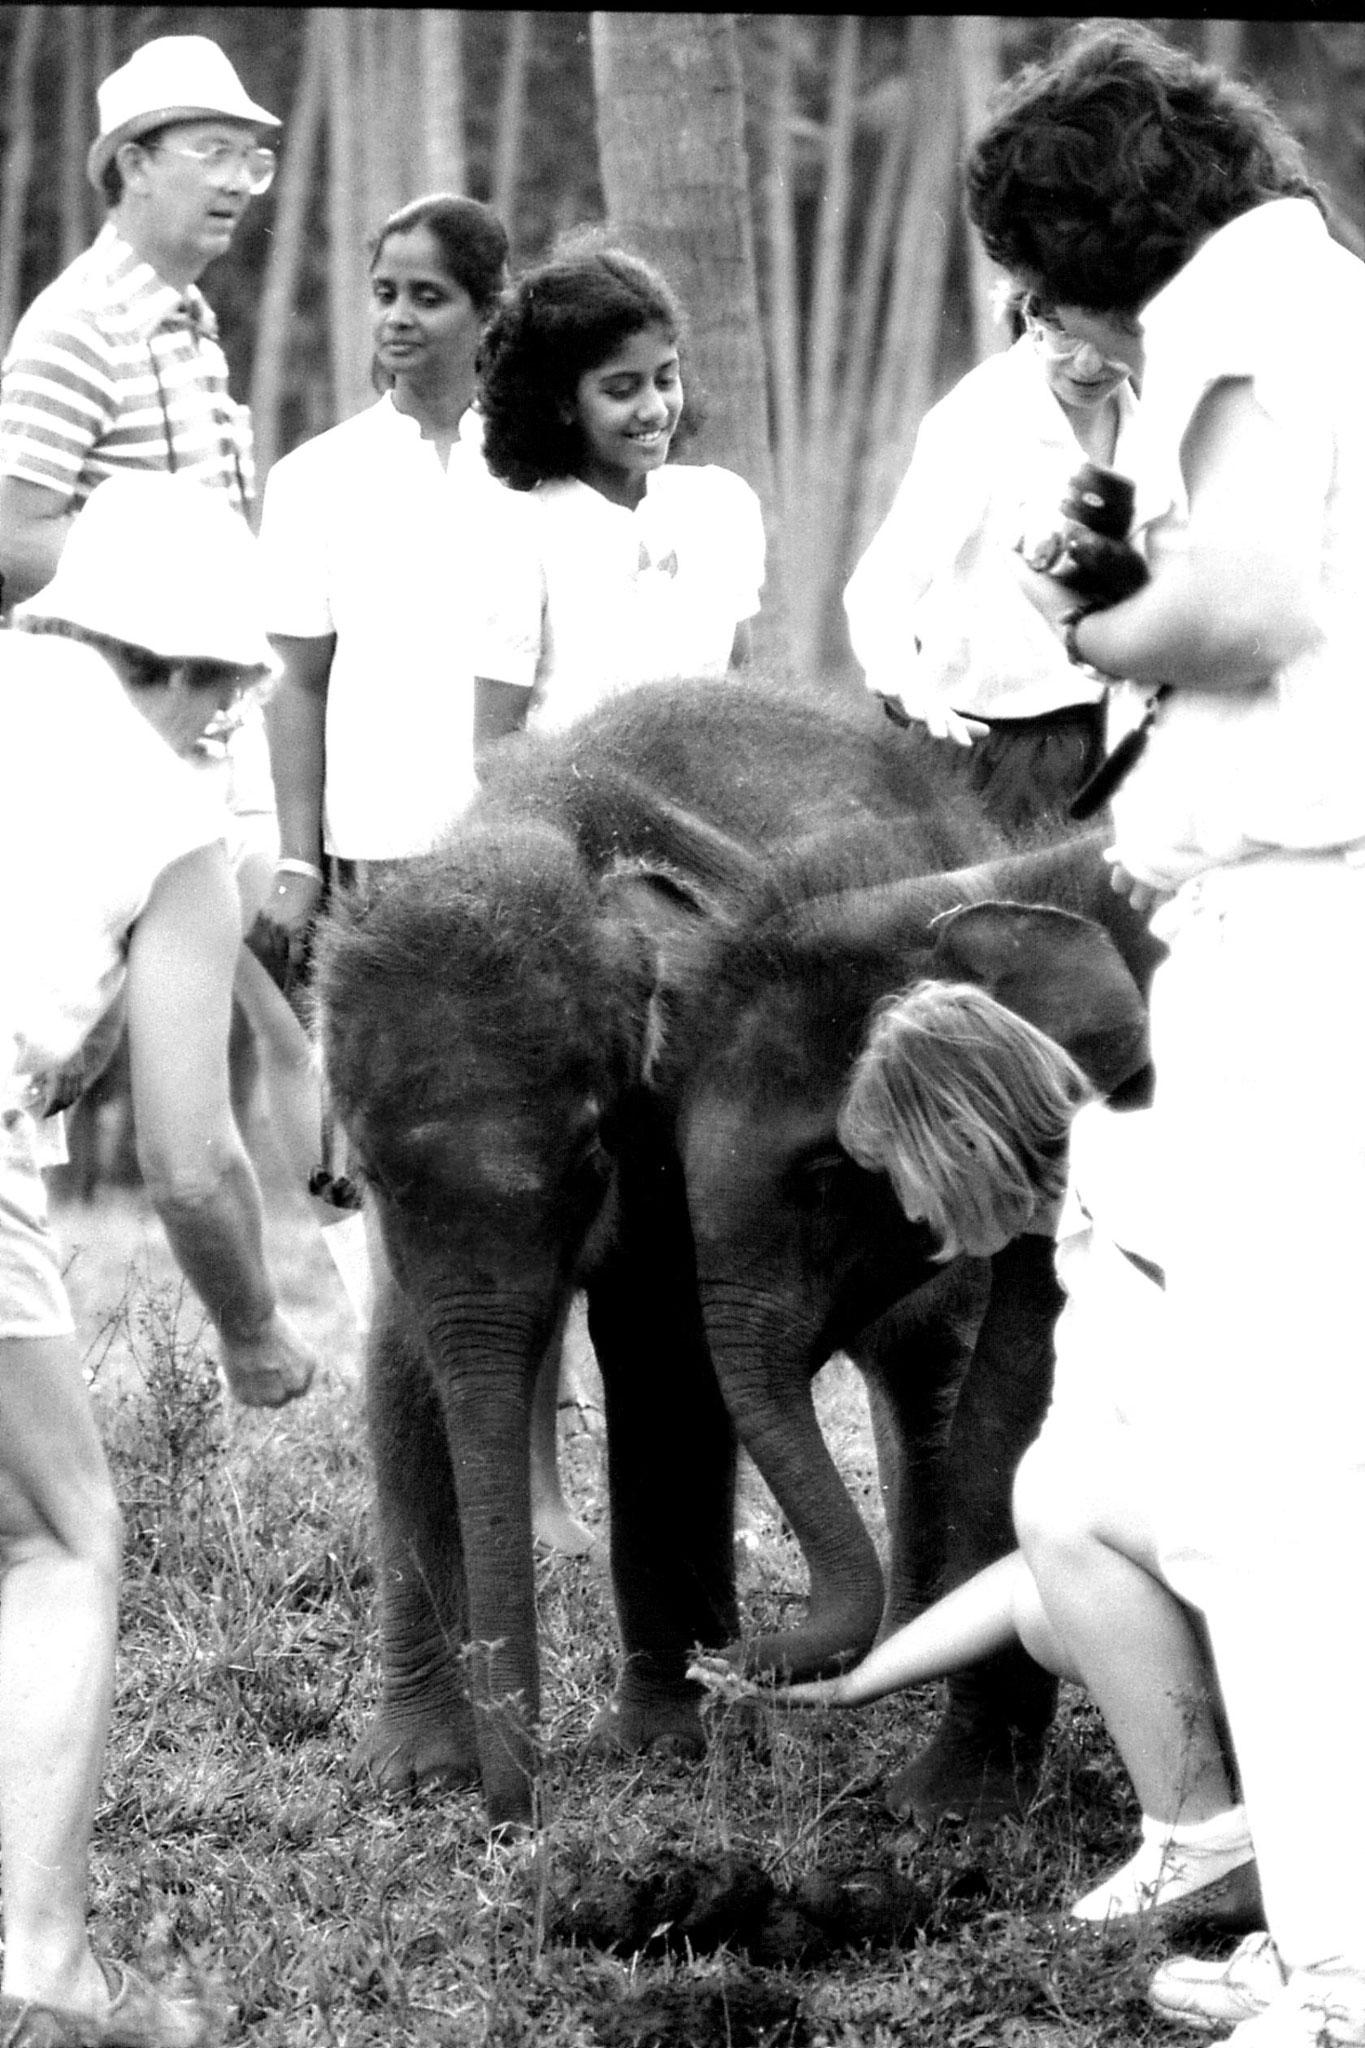 10/2/90: 31: Kegalla elephant orphanage